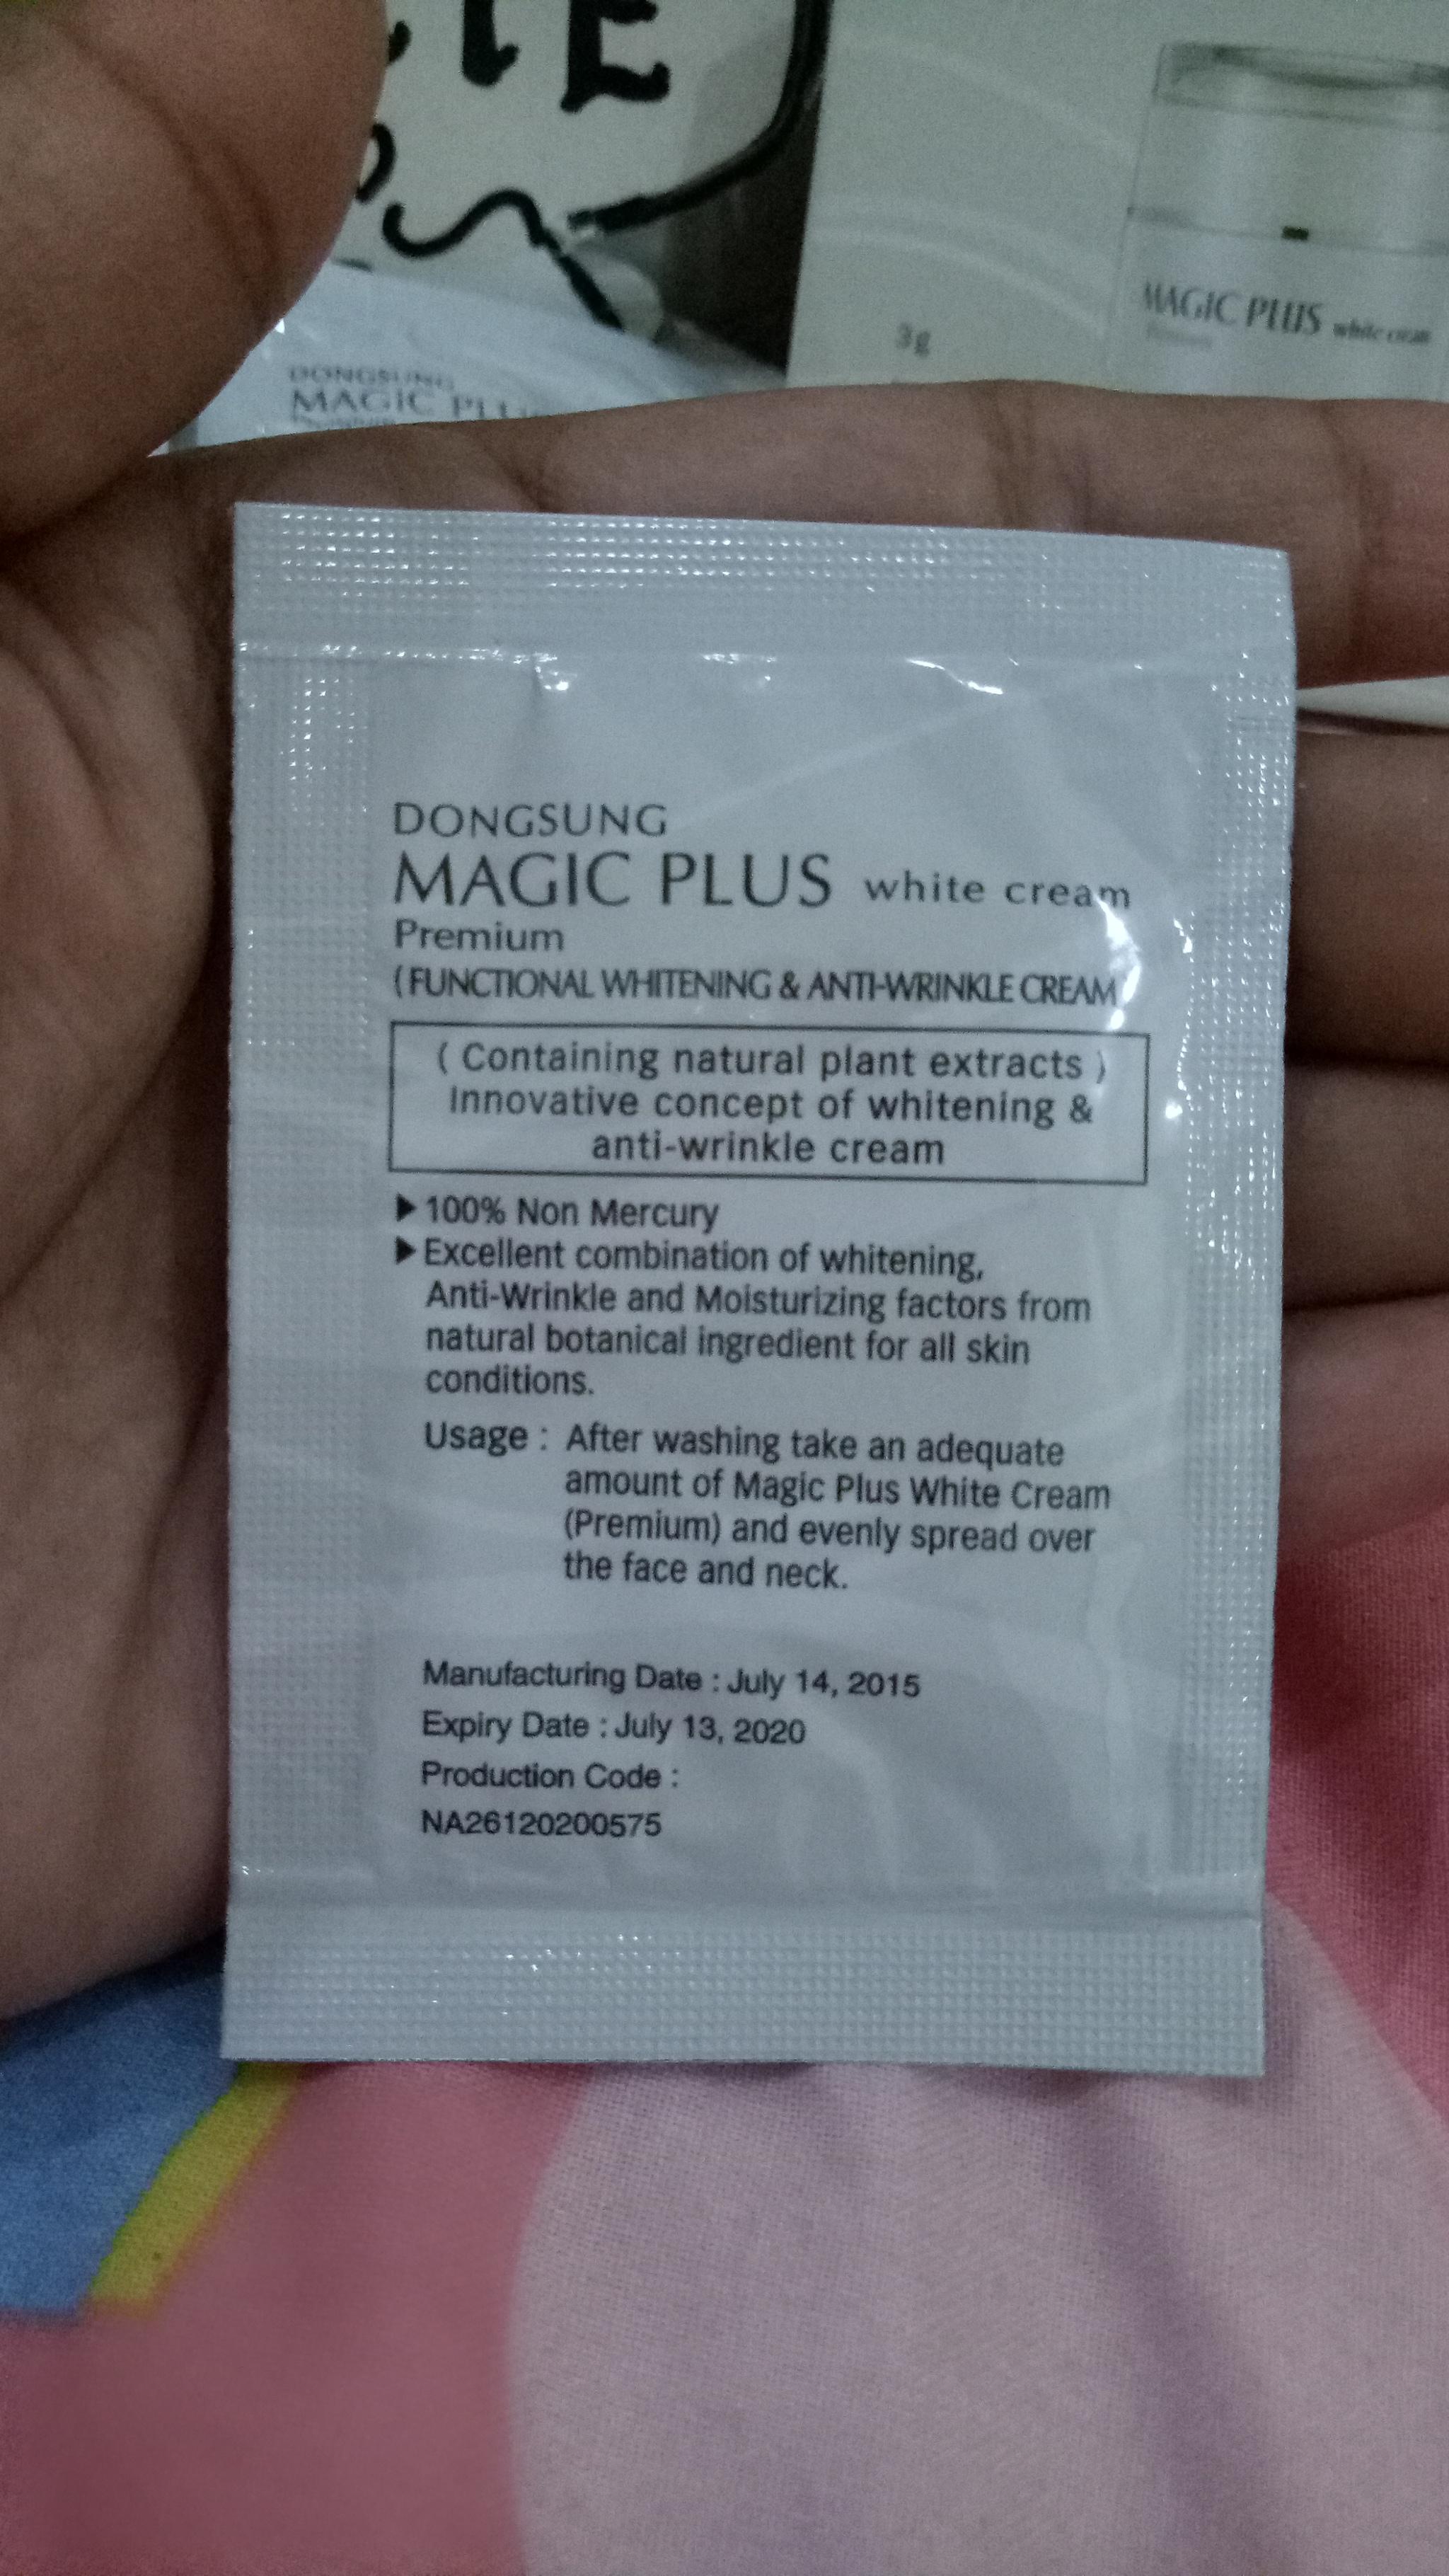 Magic Plus Premium White Cream 10 Sachet Page 5 Daftar Update 100 Original Lejel Home Shopping As Seen On Tv Dongsung Price List